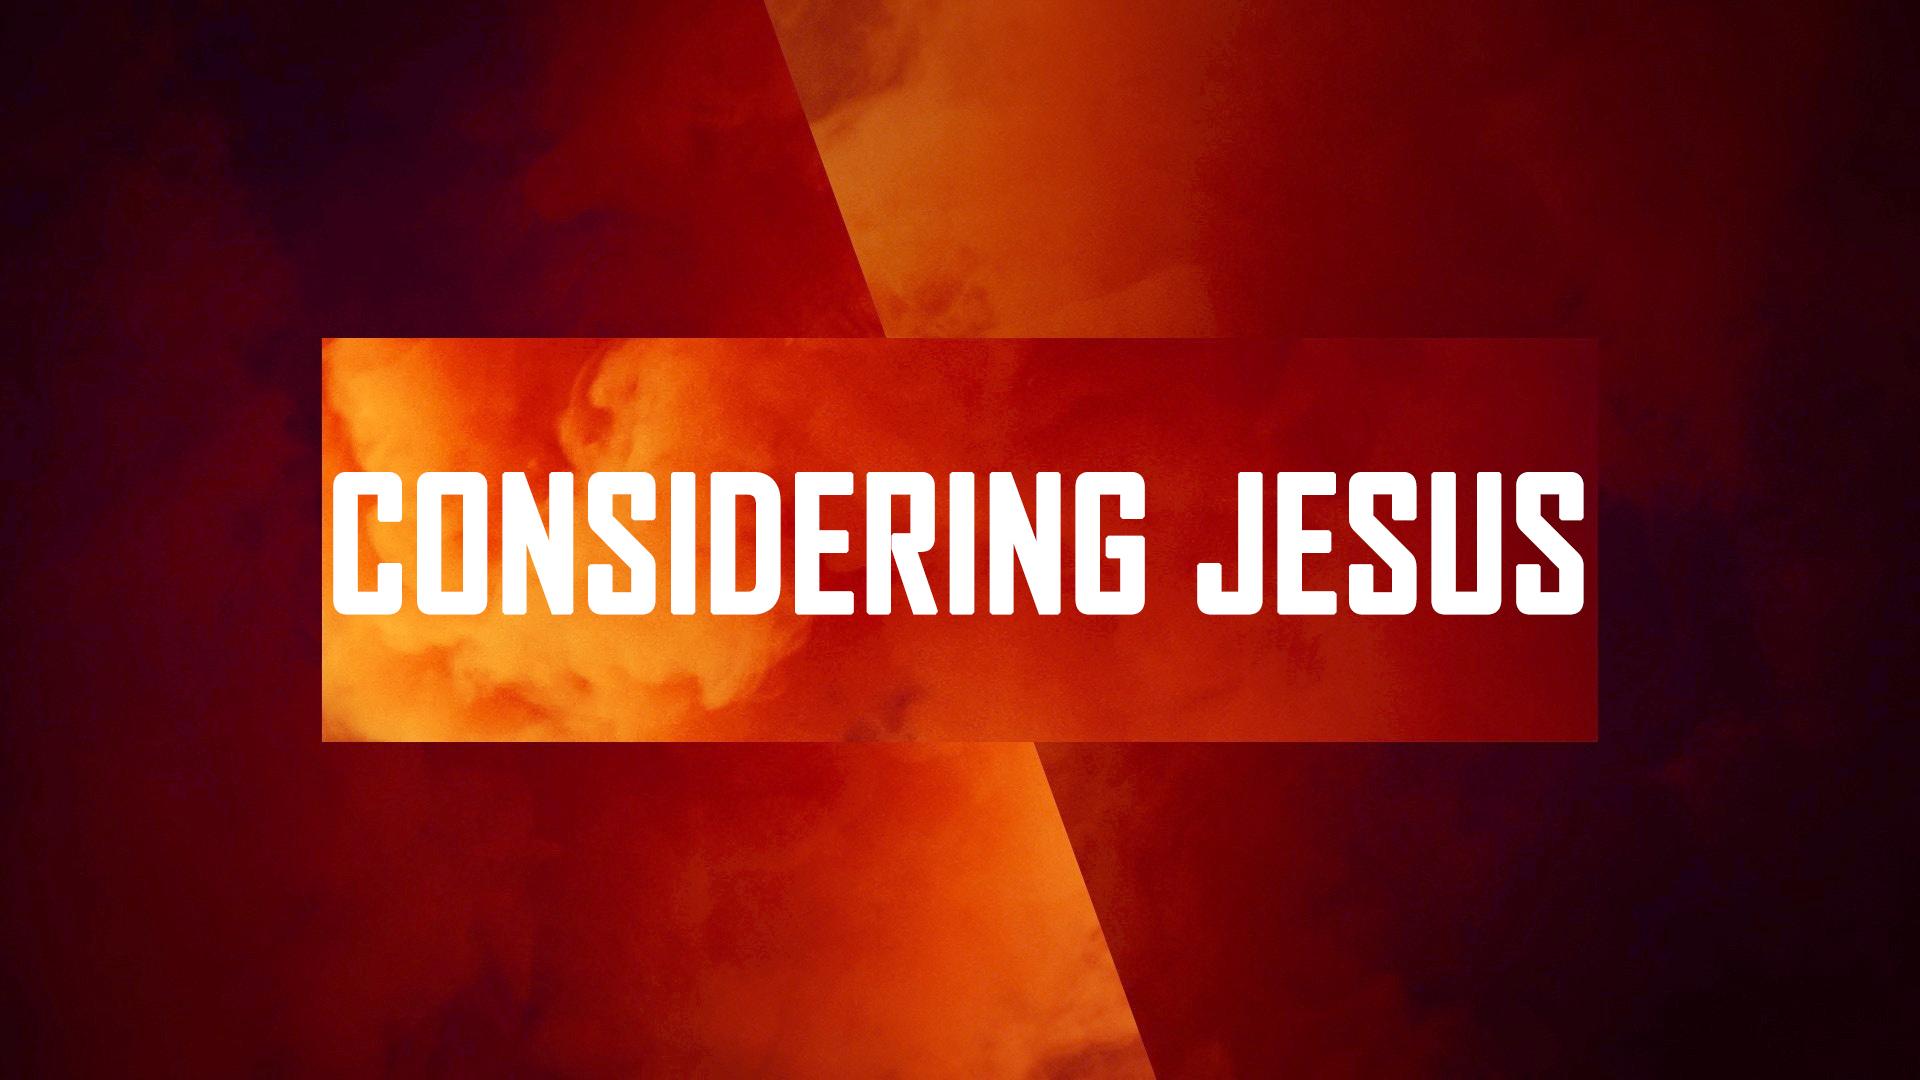 Considering Jesus<br/>Jacob K Mathai